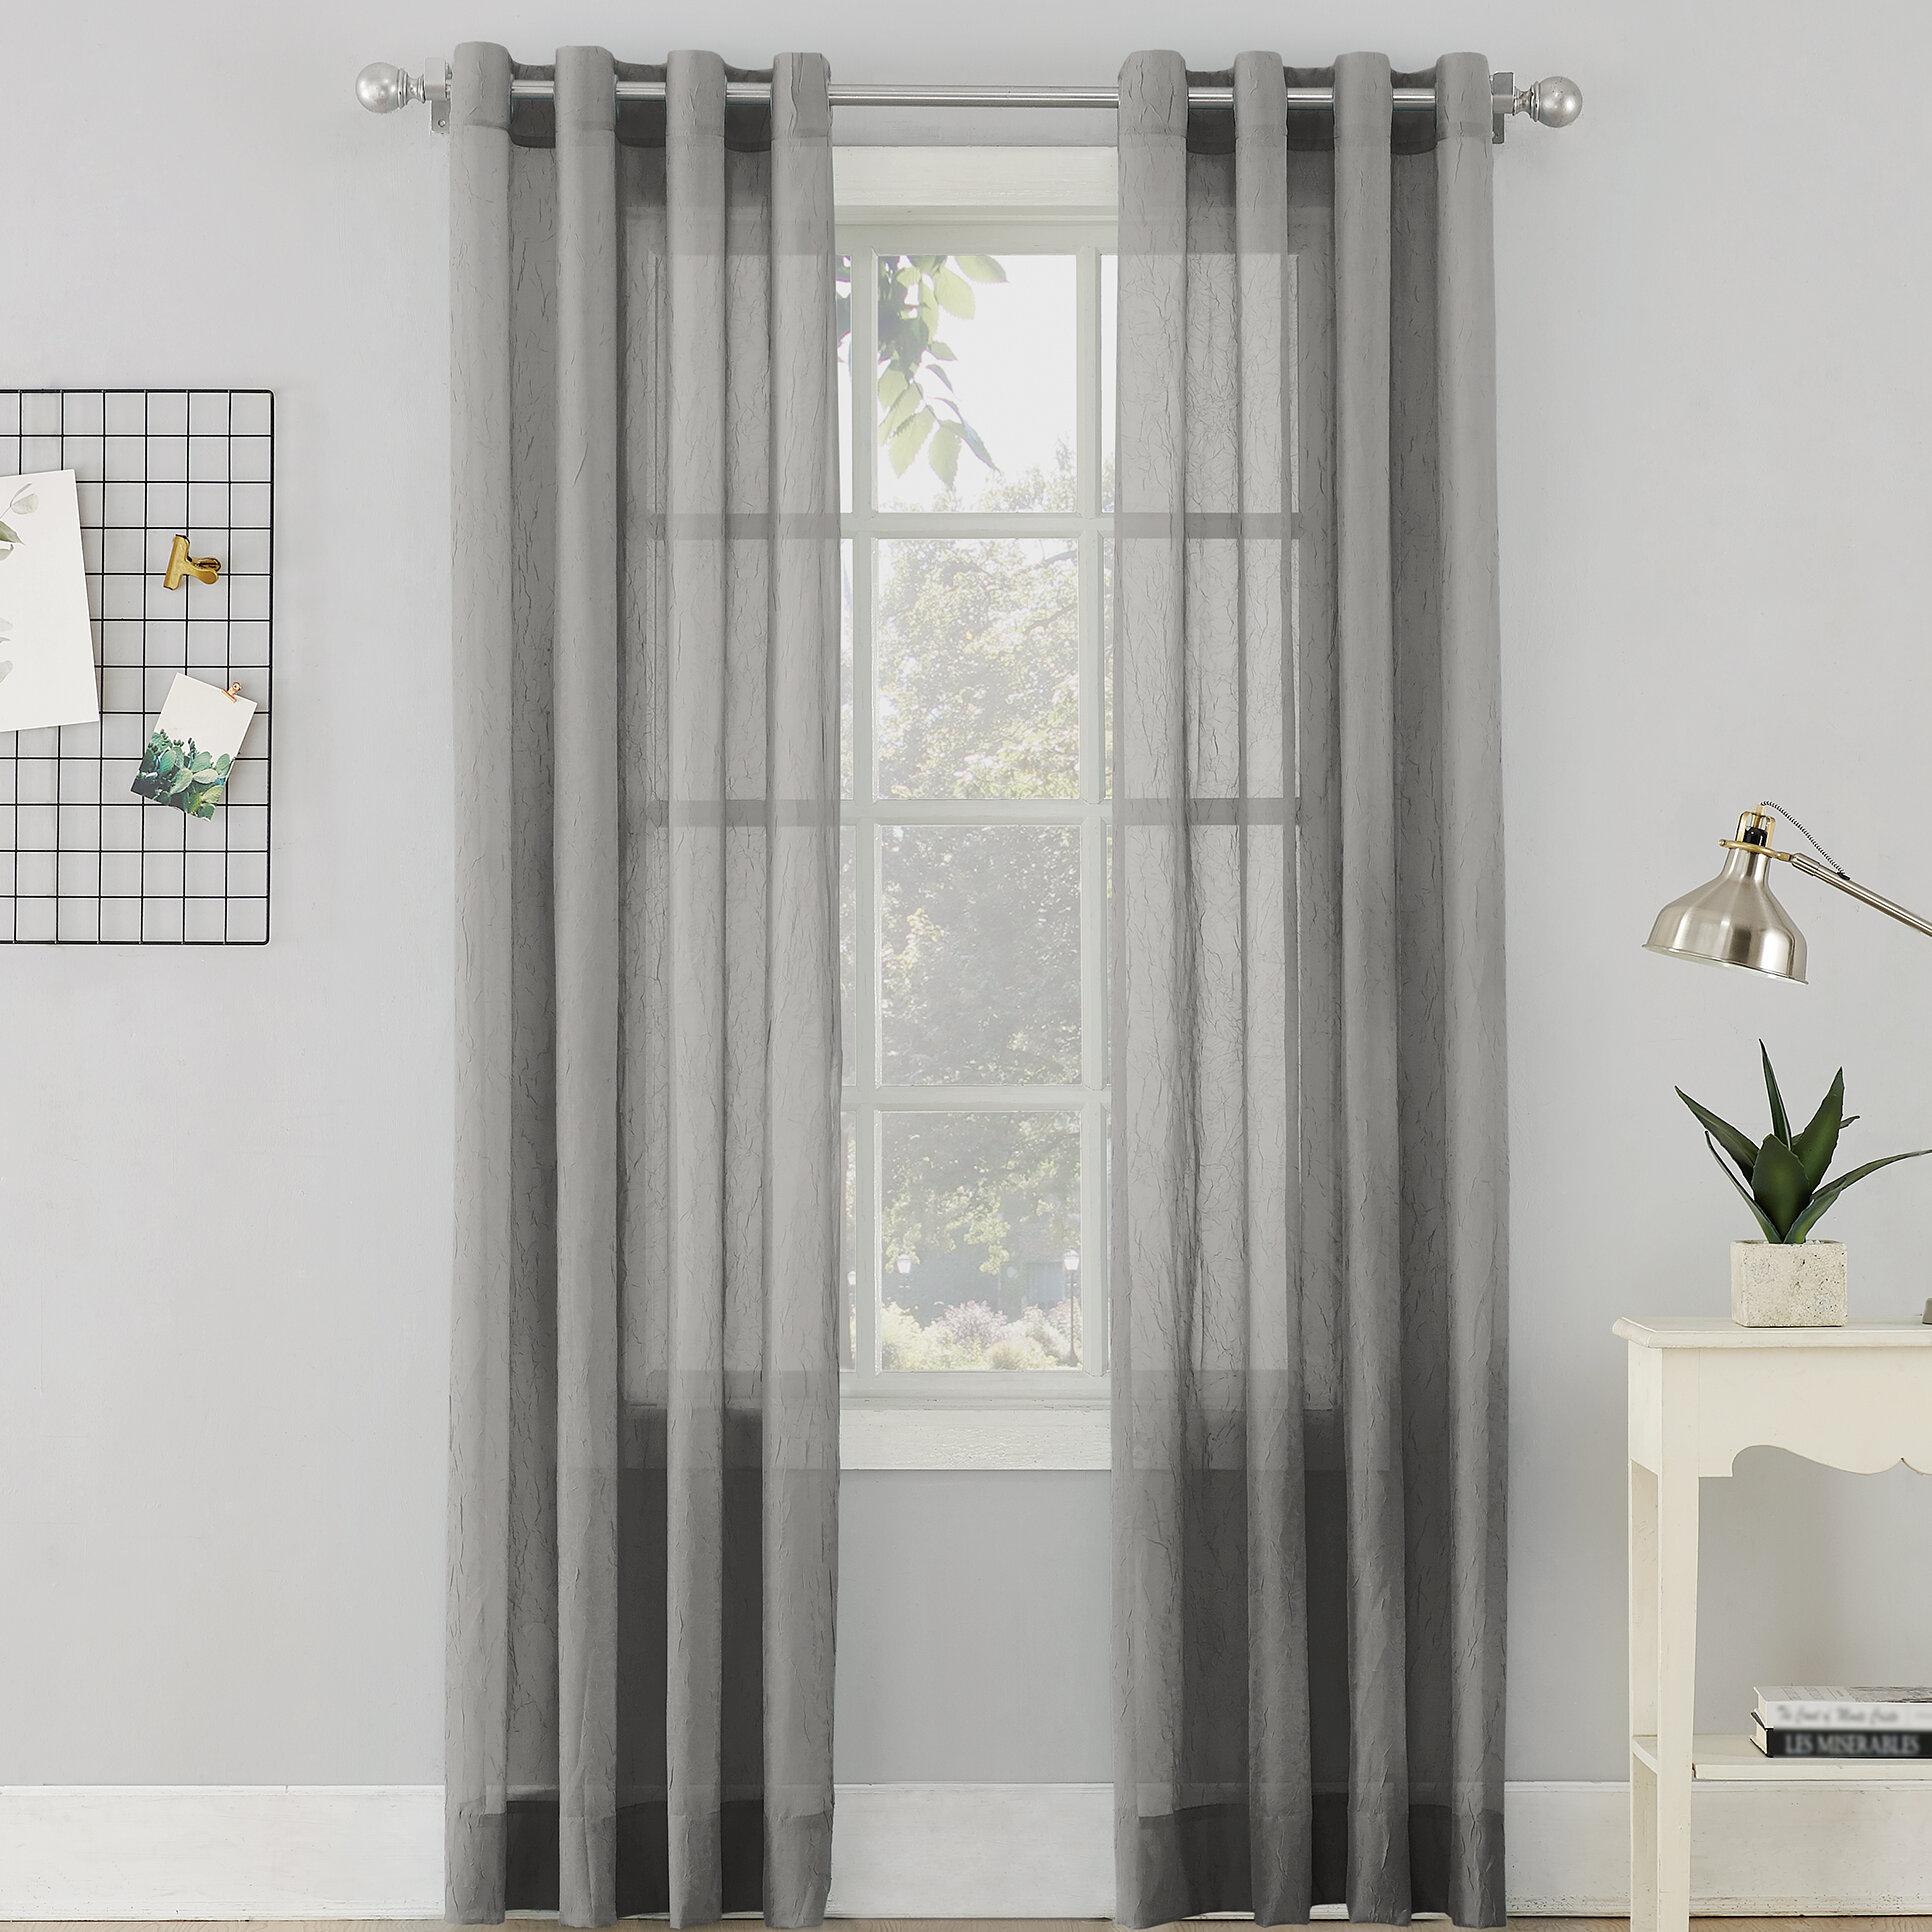 Erica Sheer Grommet Single Curtain Panel Regarding Luxury Collection Cranston Sheer Curtain Panel Pairs (View 14 of 20)